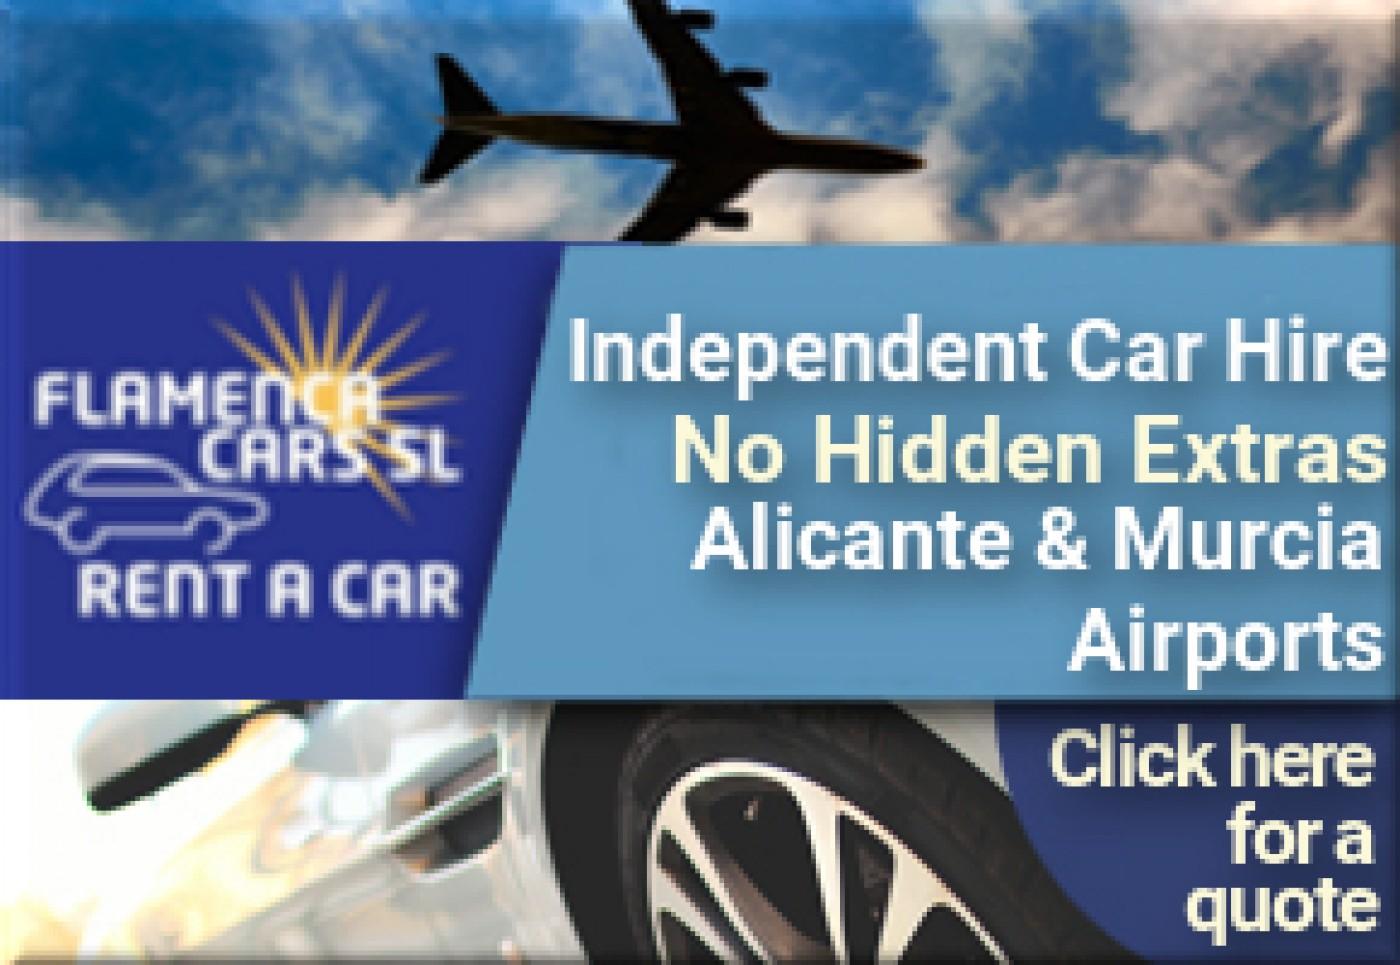 Flamenca Cars S.L. Car Hire at Alicante and Murcia Airports